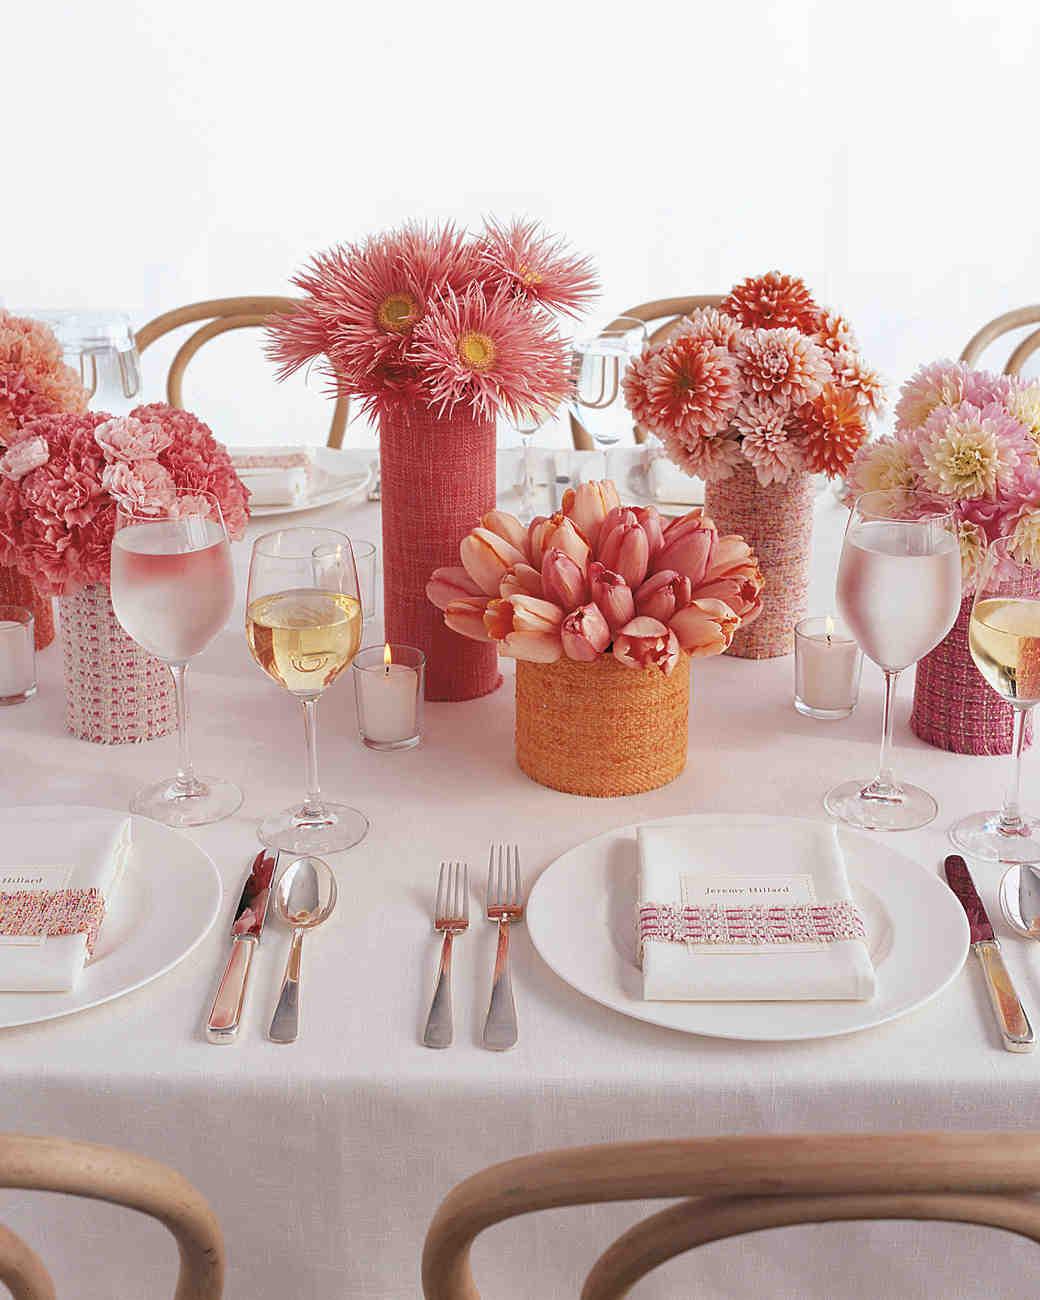 Winter Wonderland Weddings Ideas - Best wedding ideas. All about ...